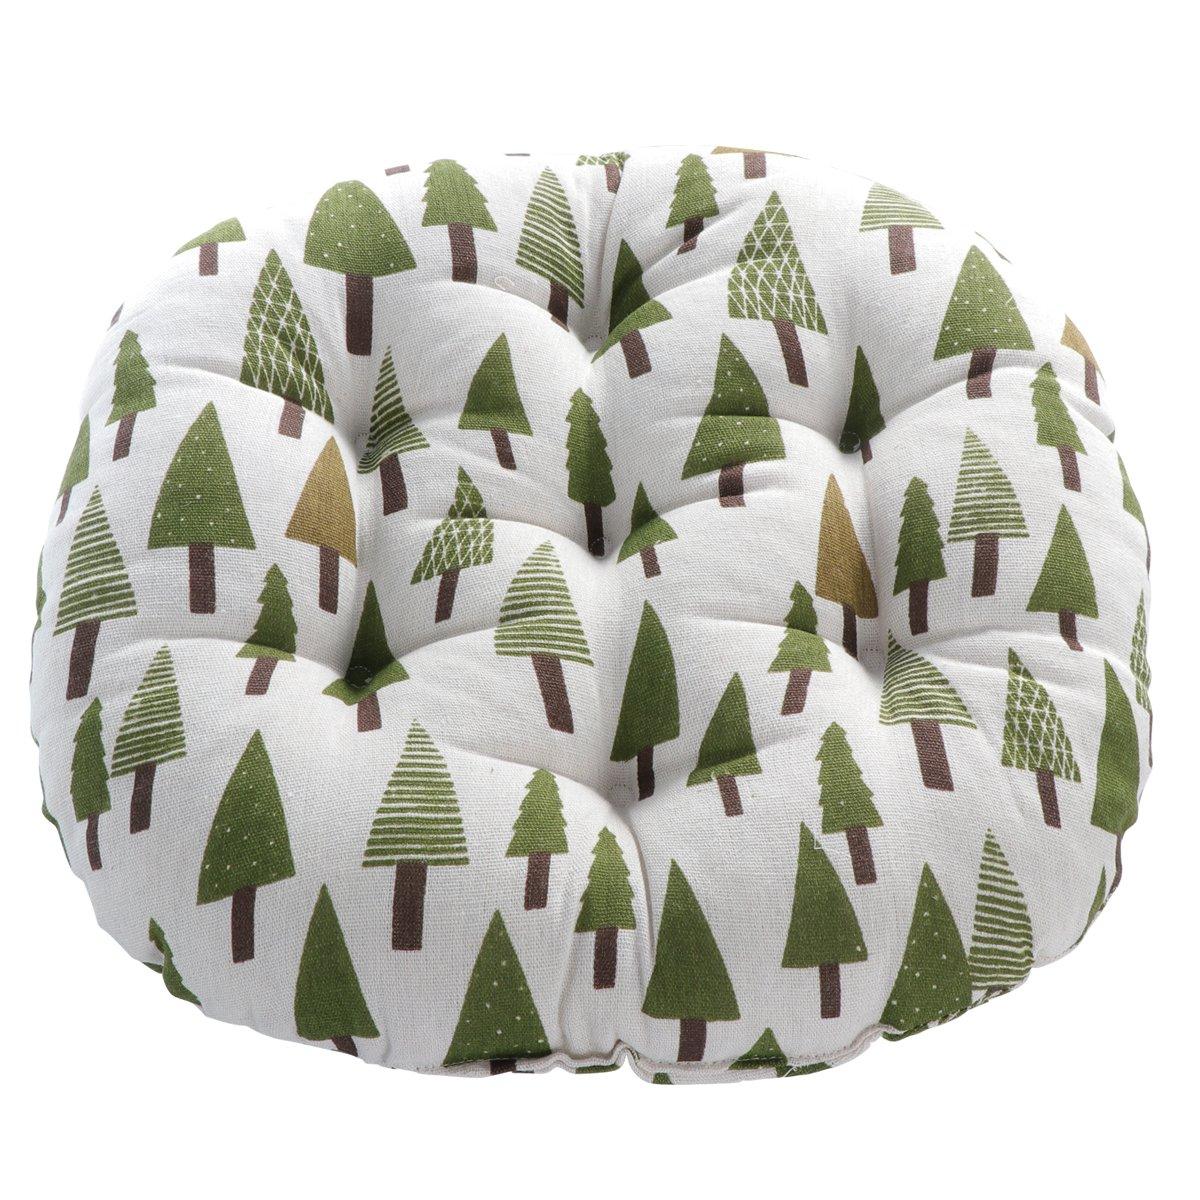 WINOMO Round Floor Pillow Cushion Cotton Linen Pouf Seat Cushion Yoga Window Tatami Home Office Pad (Trees Pattern)